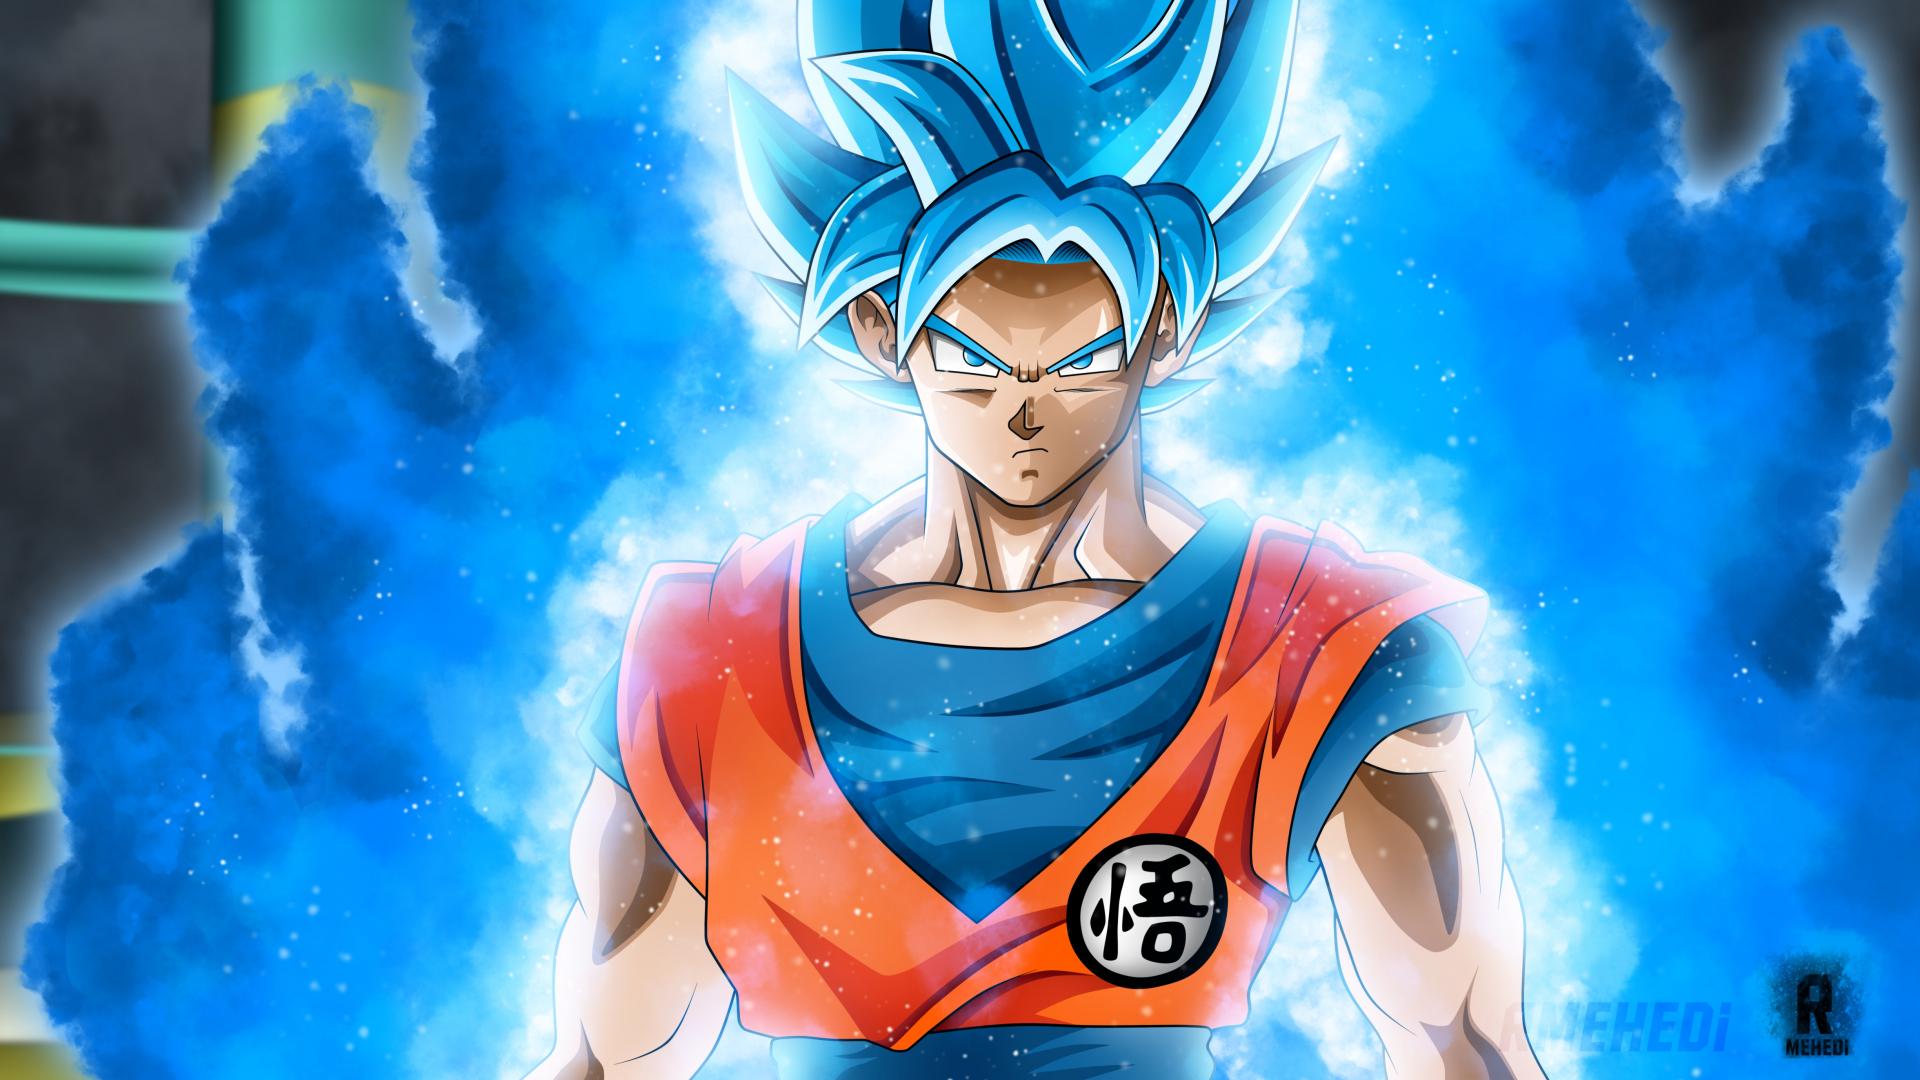 Download 1920x1080 Wallpaper Dragon Ball Super Blue Goku Anime